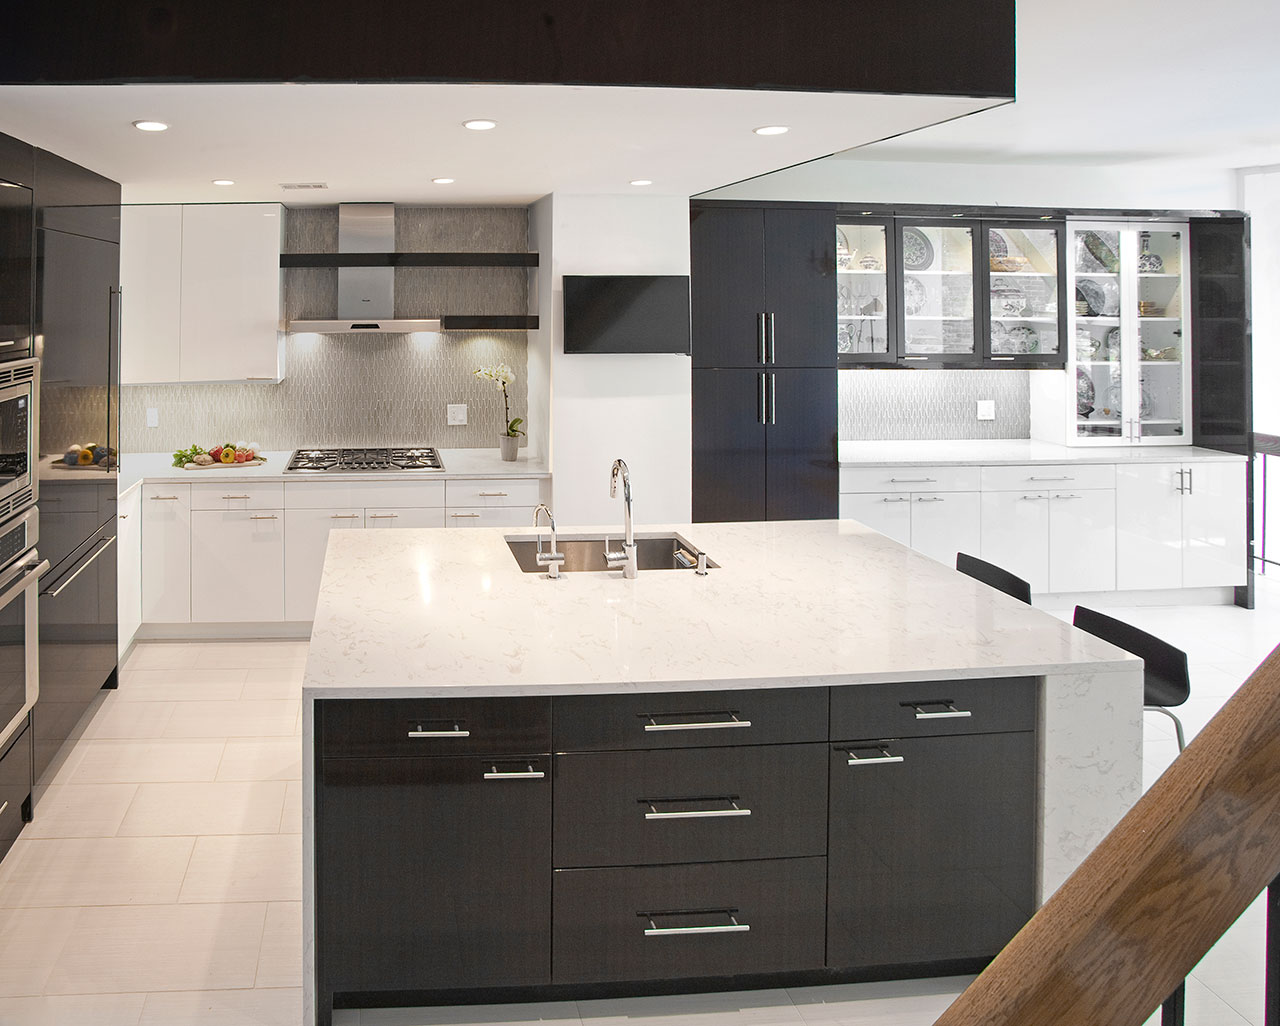 Contemporary Kitchens Designs | Greater Phila. Area ... on Modern Kitchen Design Ideas  id=14805